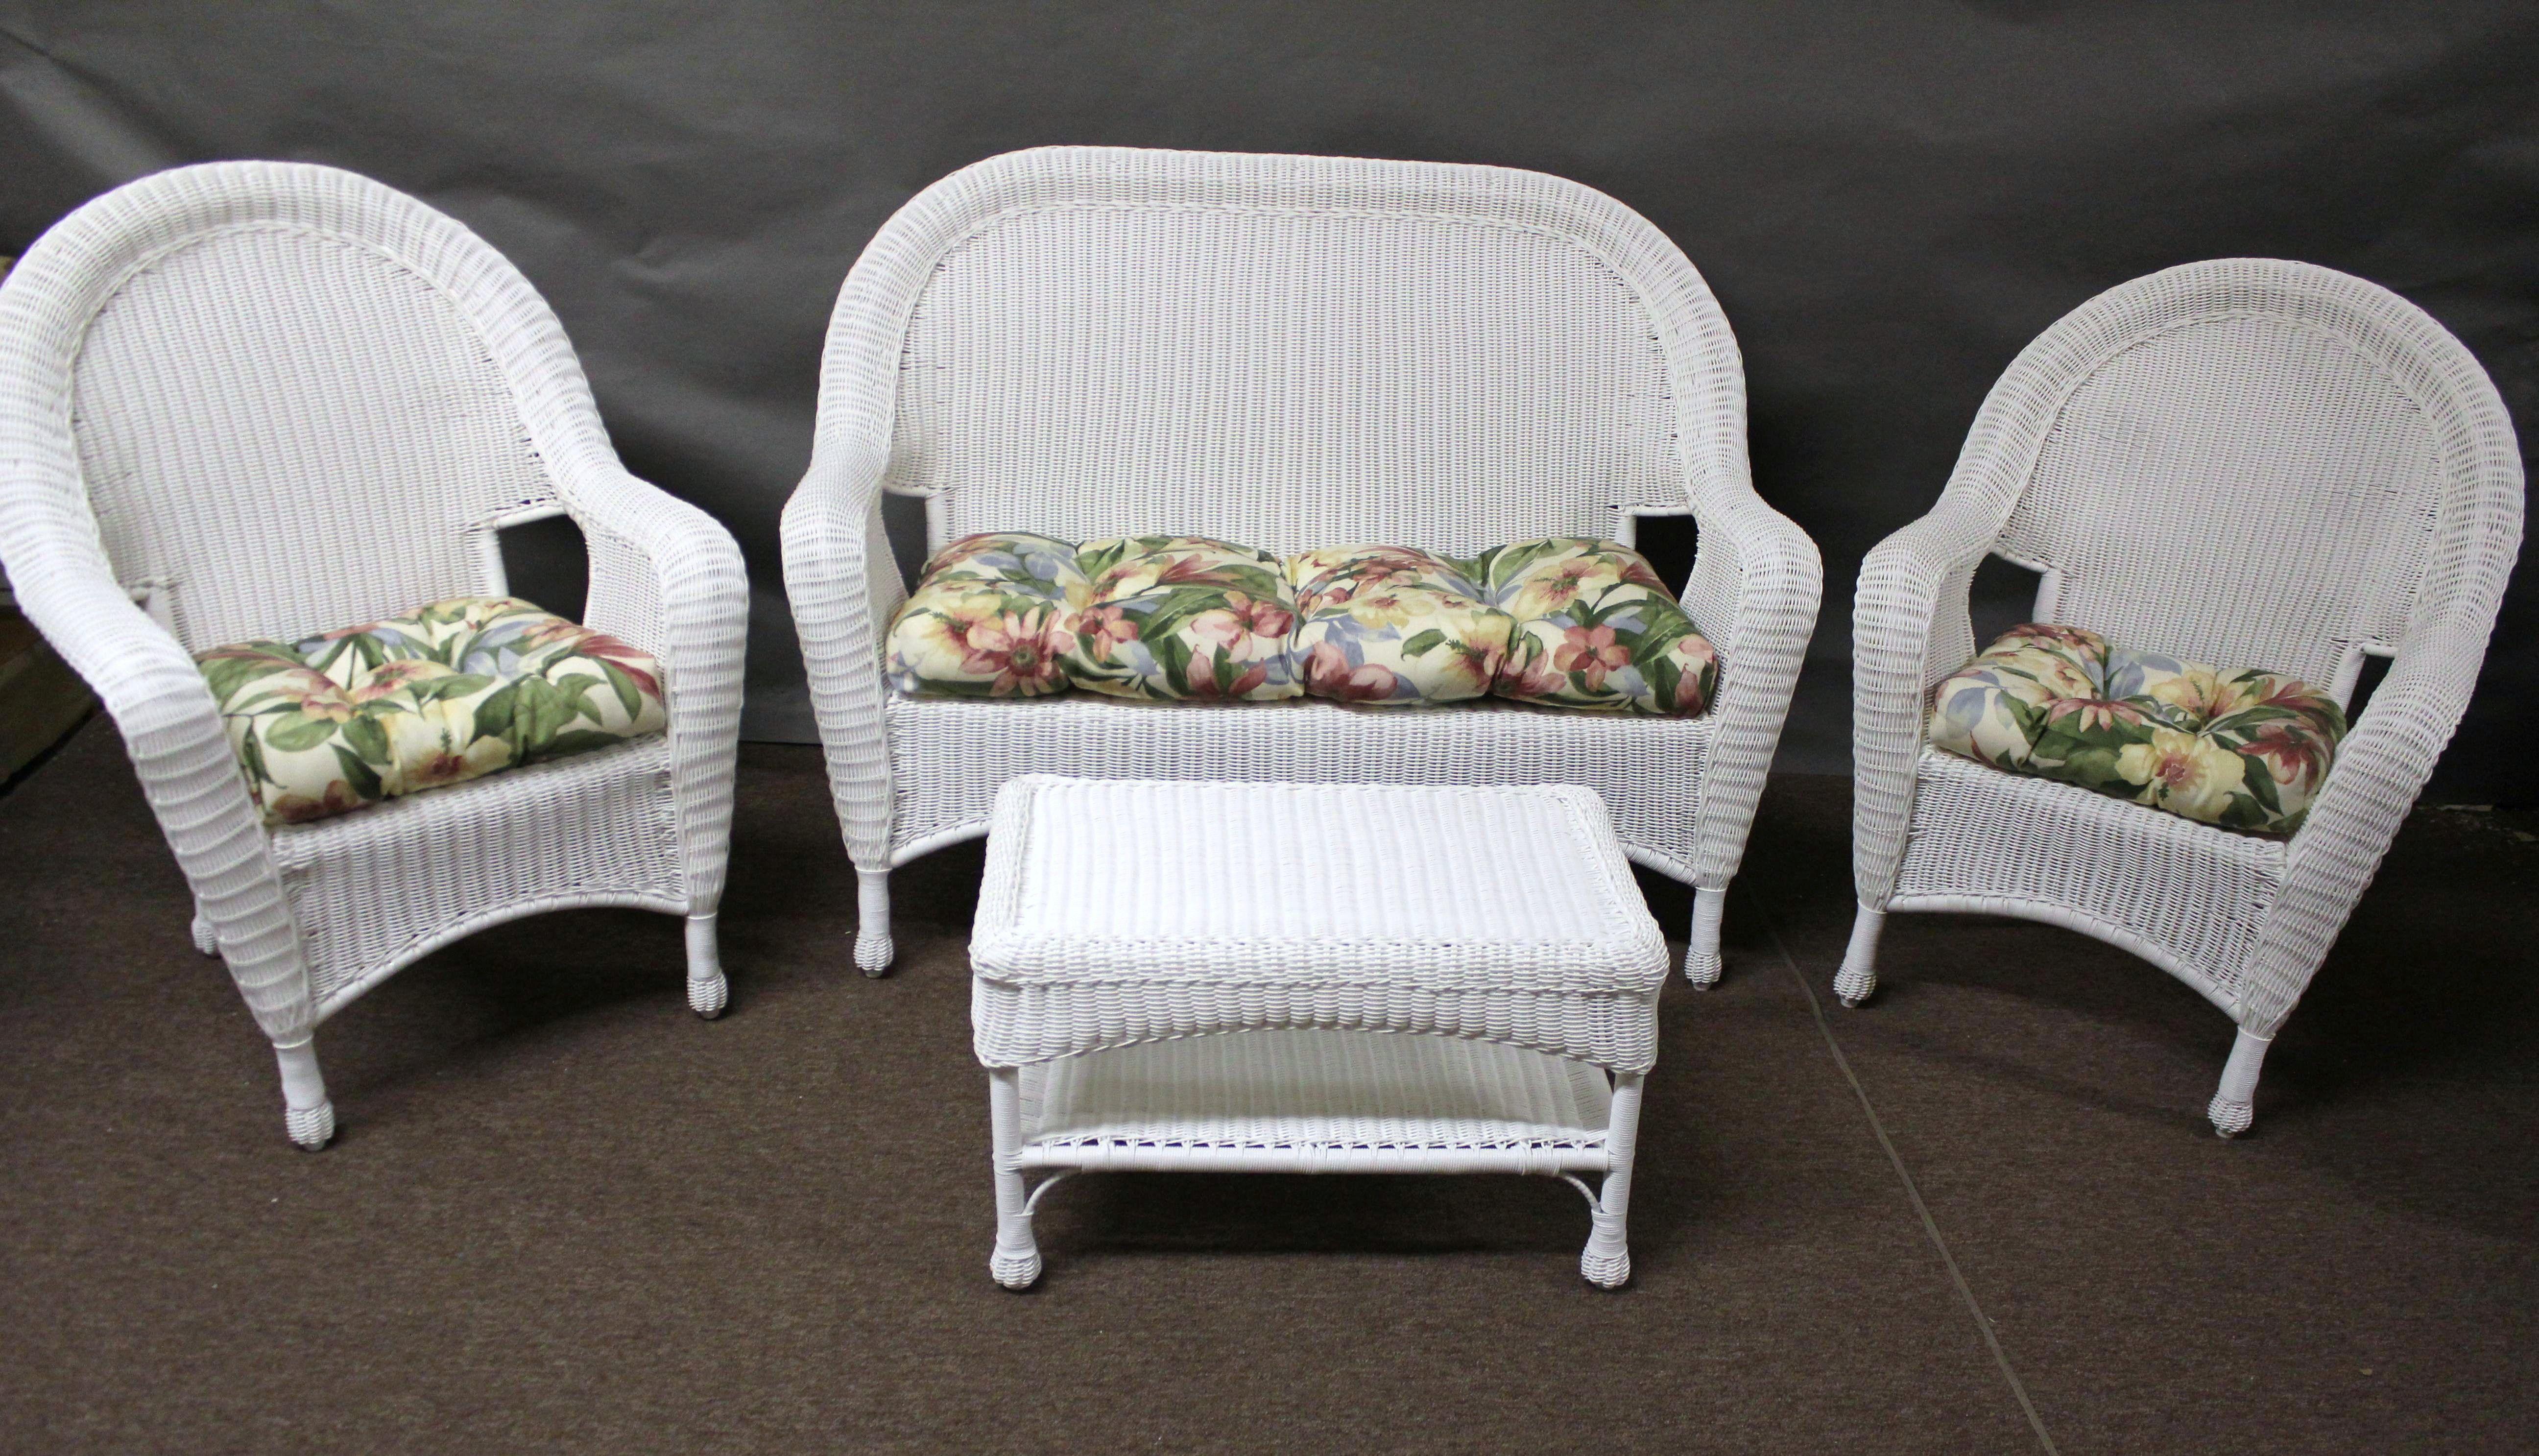 Lovely Wicker Patio Cushions